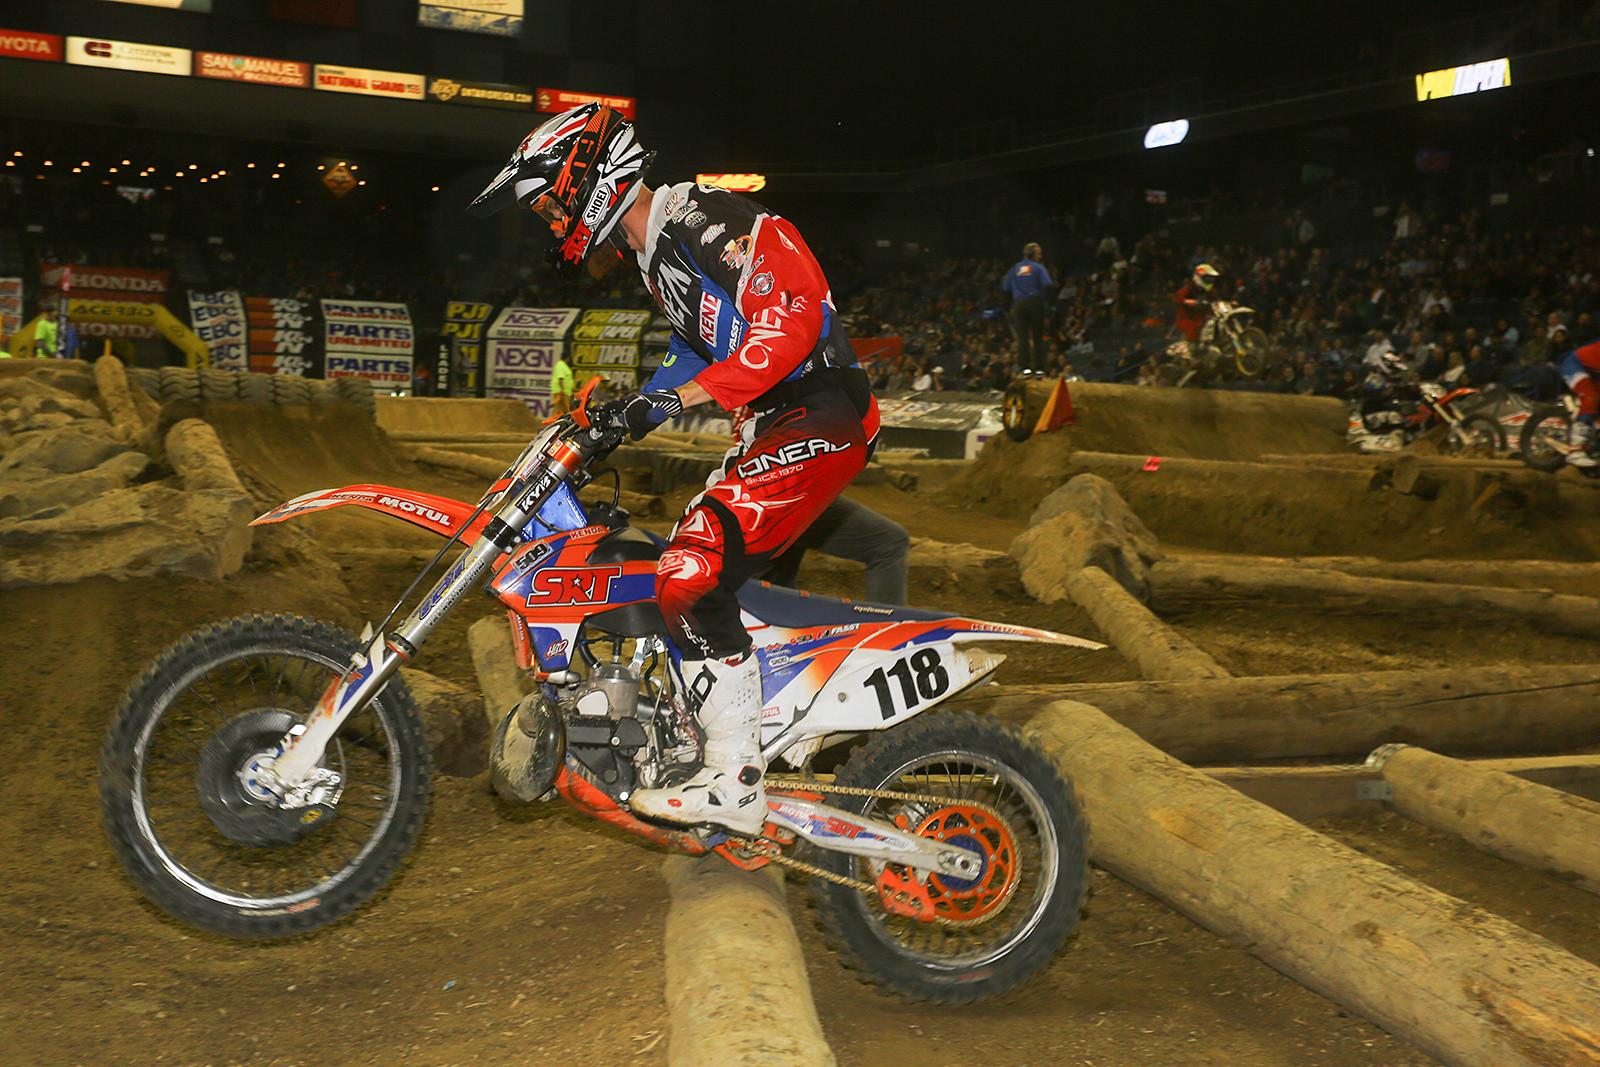 Cory Graffunder - Endurocross Finals - Motocross Pictures - Vital MX